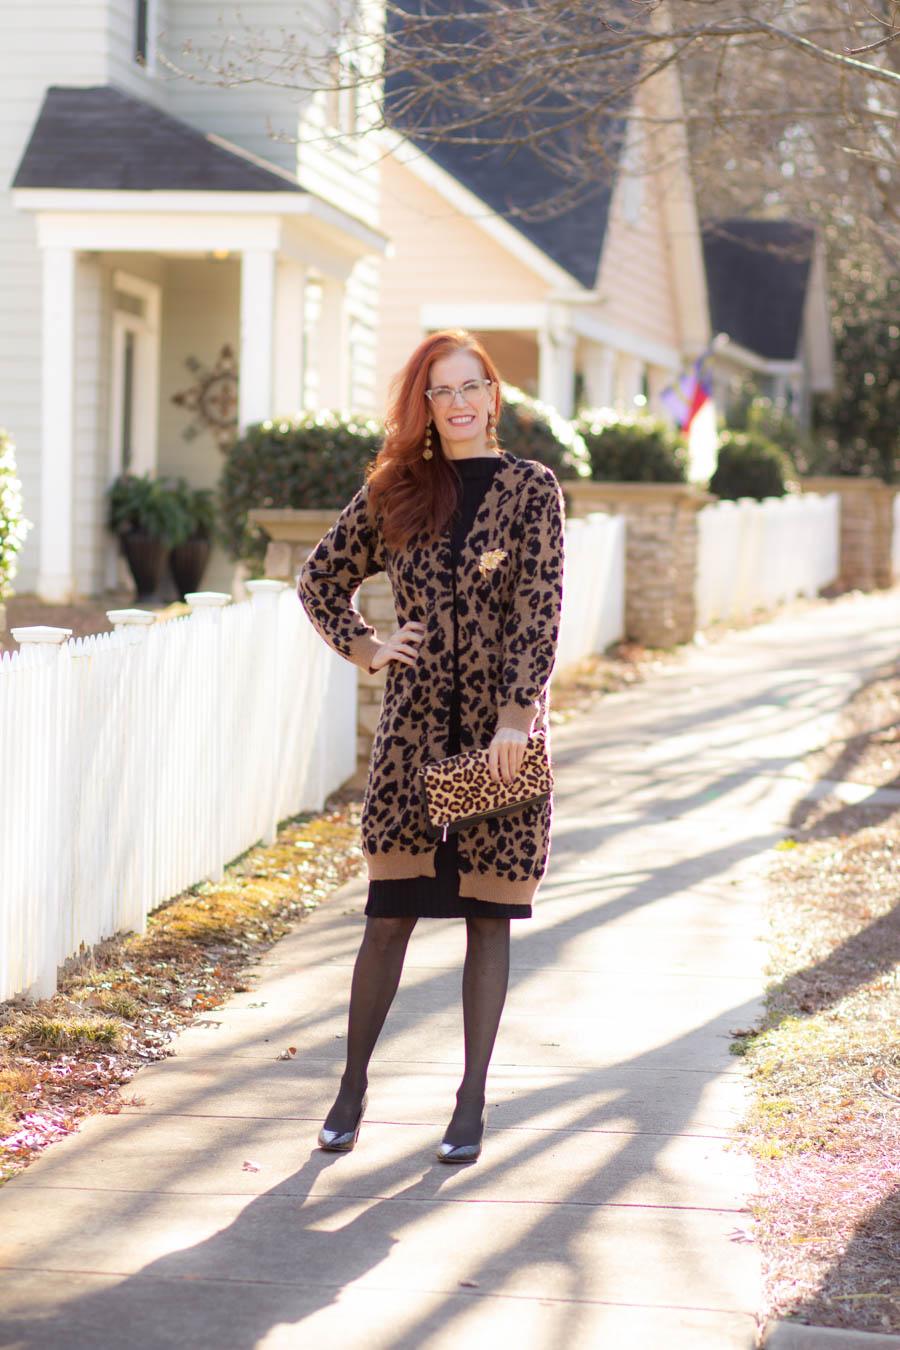 Leopard cardigan over knit black dress